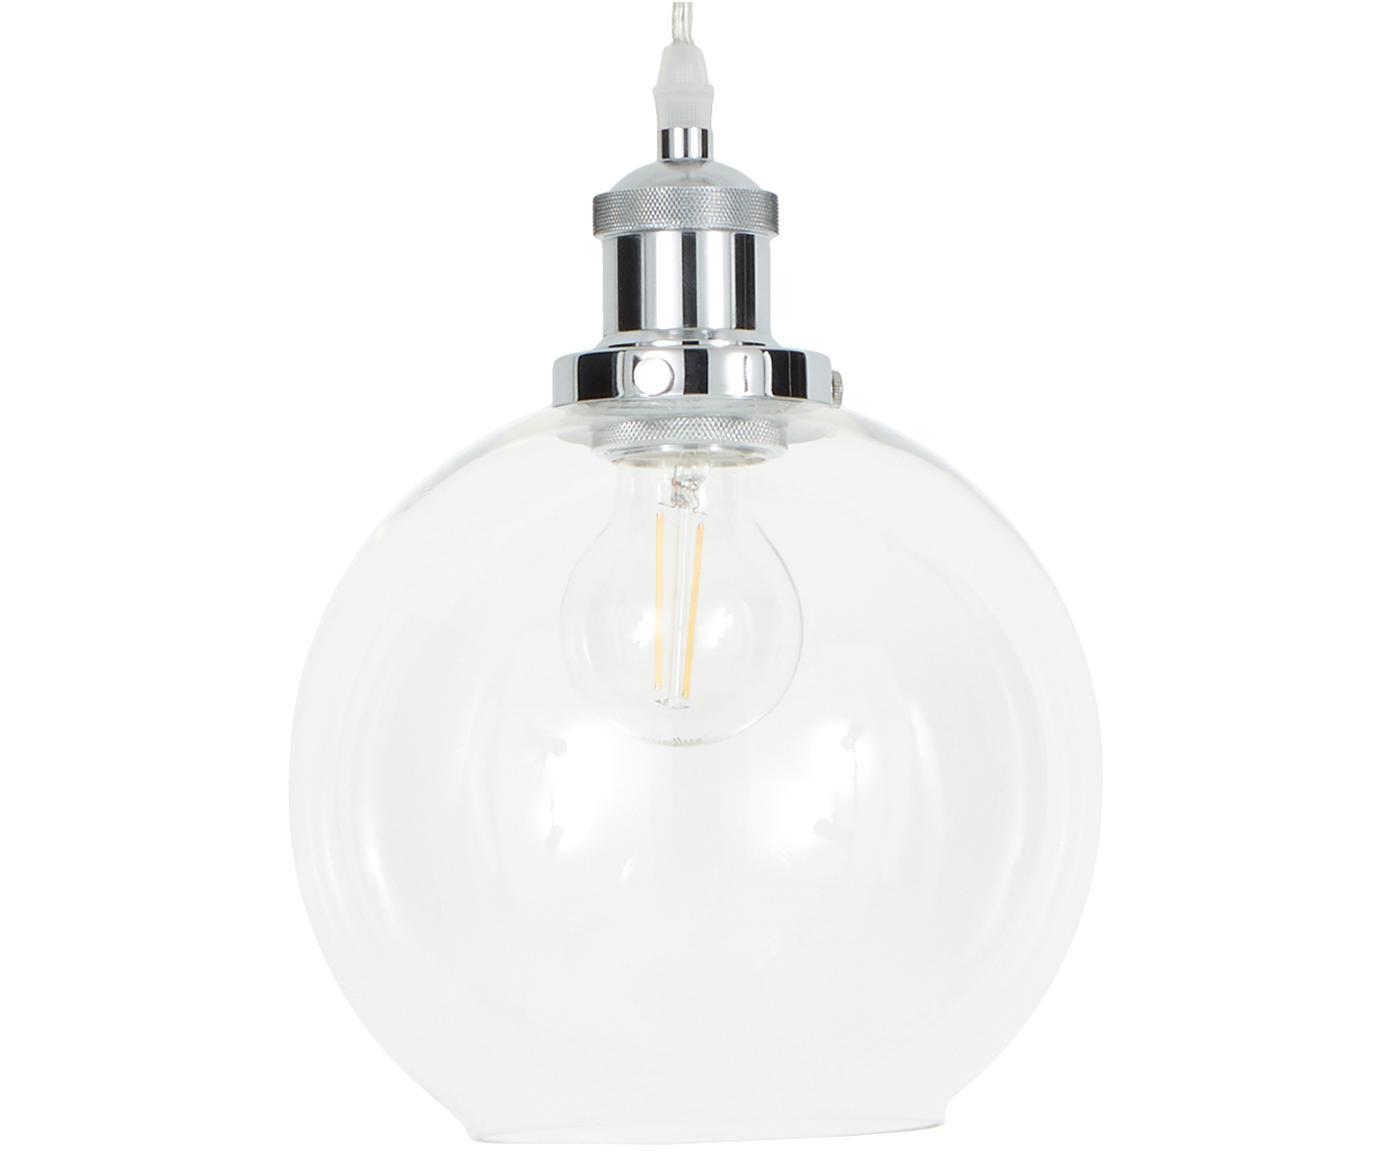 Lampada a sospensione in vetro New York Loft, Paralume: vetro, Cromo trasparente, Ø 20 x Alt. 25 cm